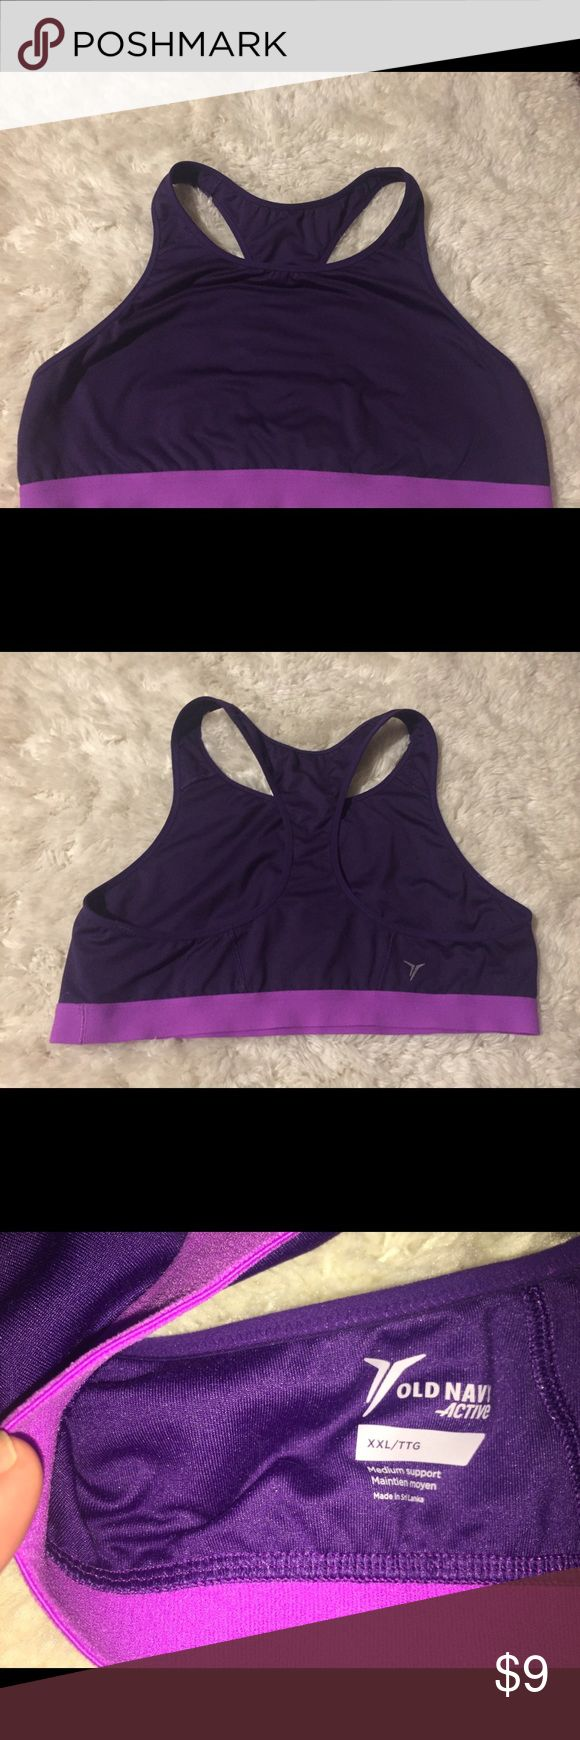 Old Navy Sports Bra Like new Old Navy Intimates & Sleepwear Bras